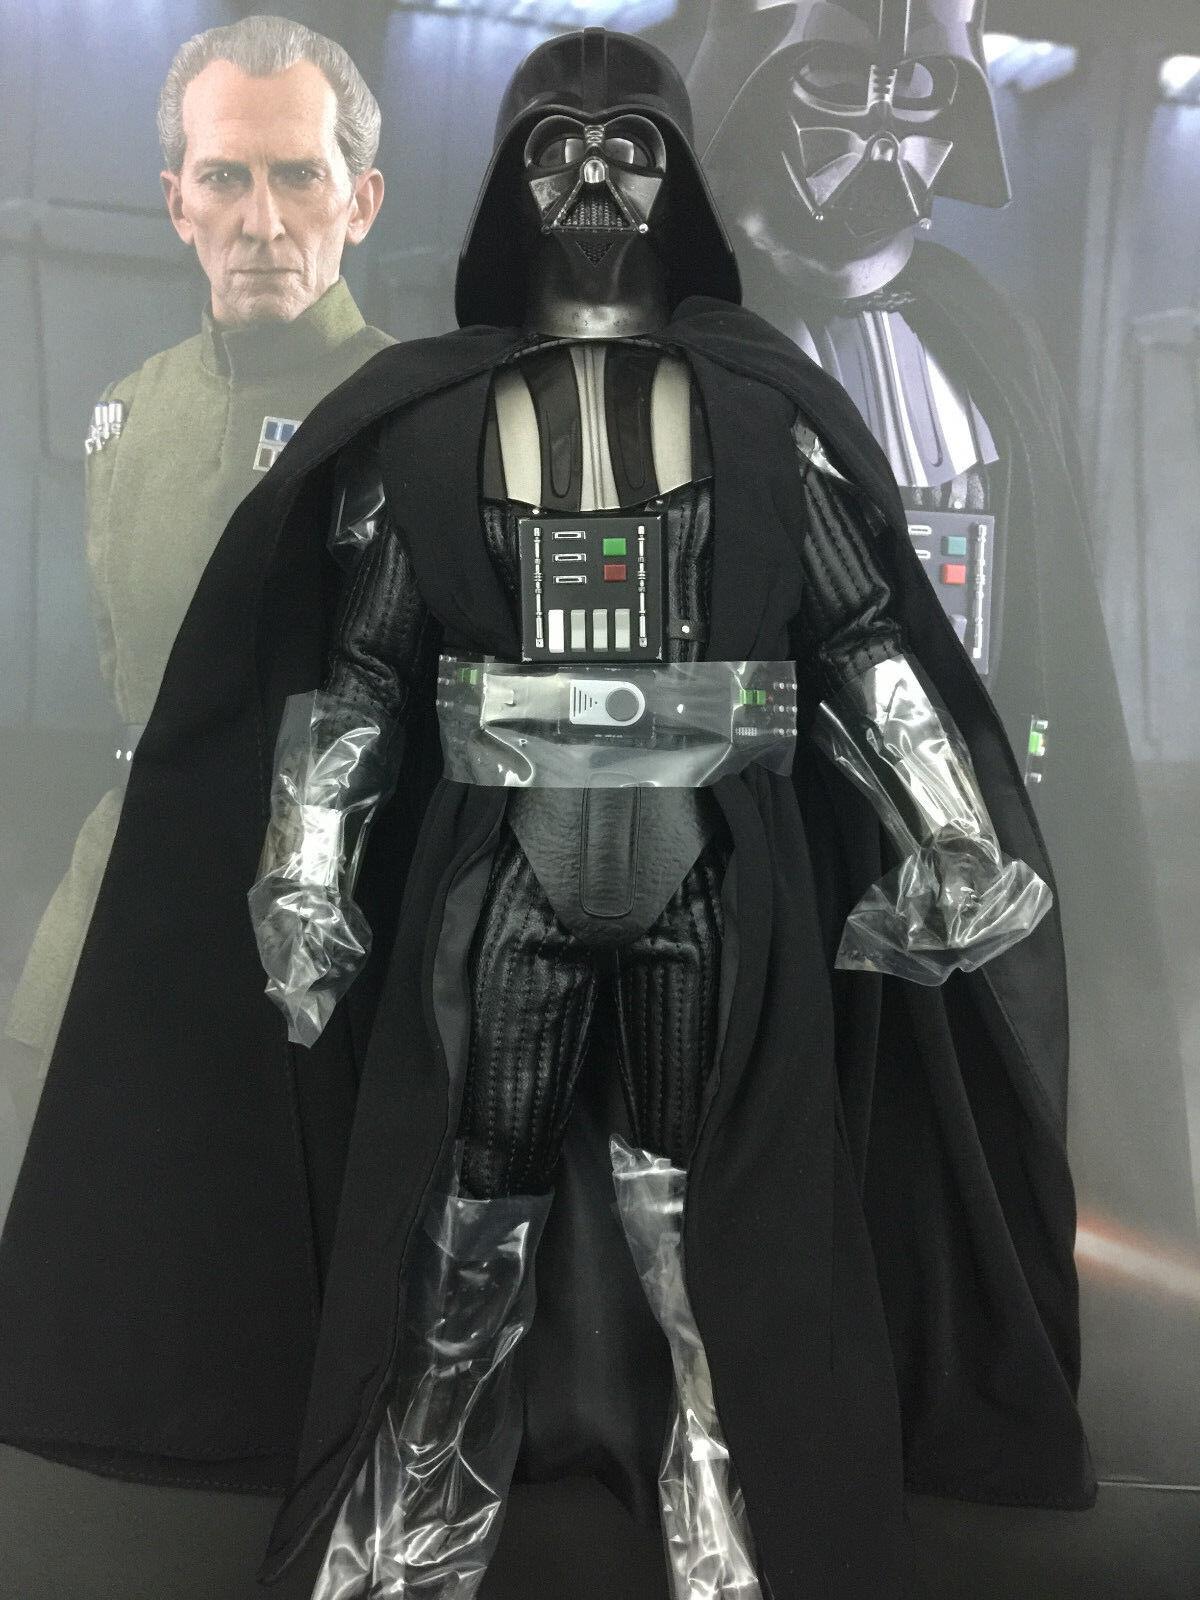 Hot toys Darth Vader & Moff Tarkin MMS434 A New Hope - 1 6th Darth Vader only